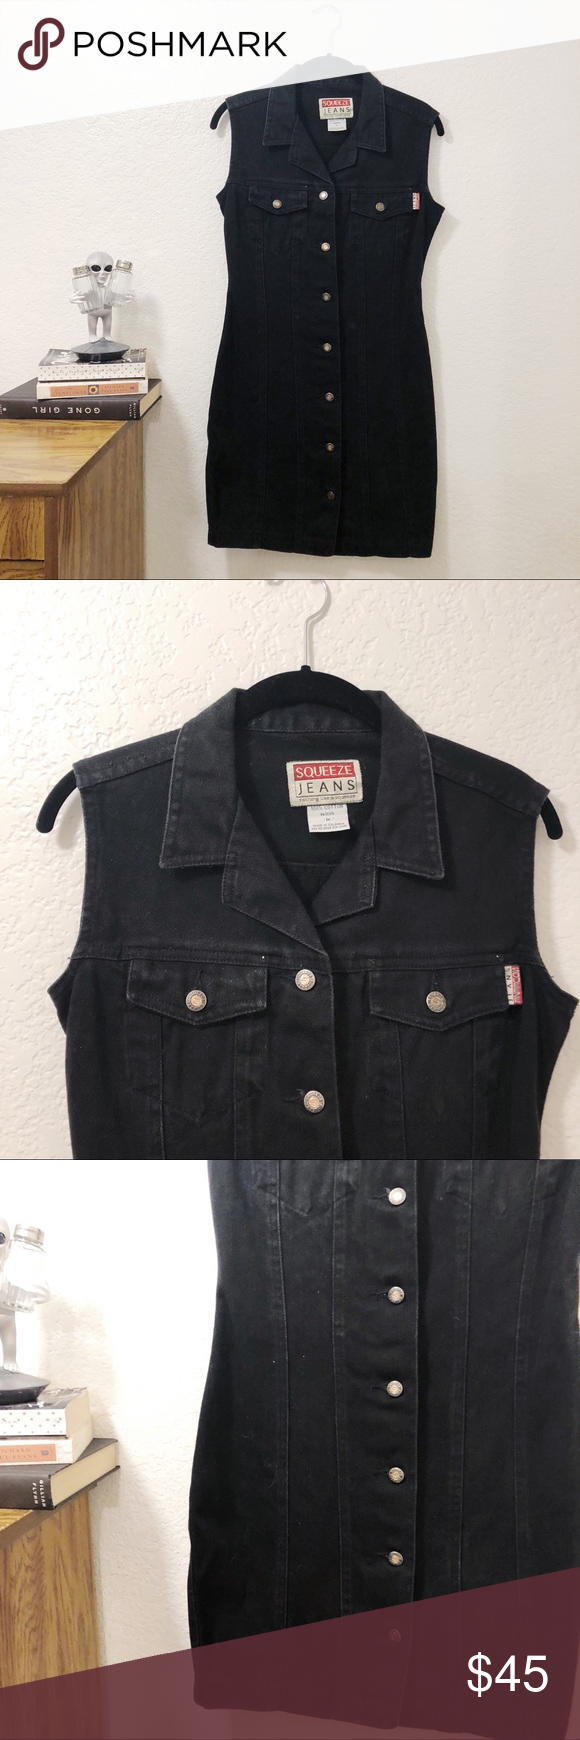 Vintage Black Denim Dress In Great Used Condition Vintage Squeeze Jeans Denim Dress 100 Cotton Tagged A Size M Length 33 Wa Denim Dress Black Denim Denim [ 1740 x 580 Pixel ]